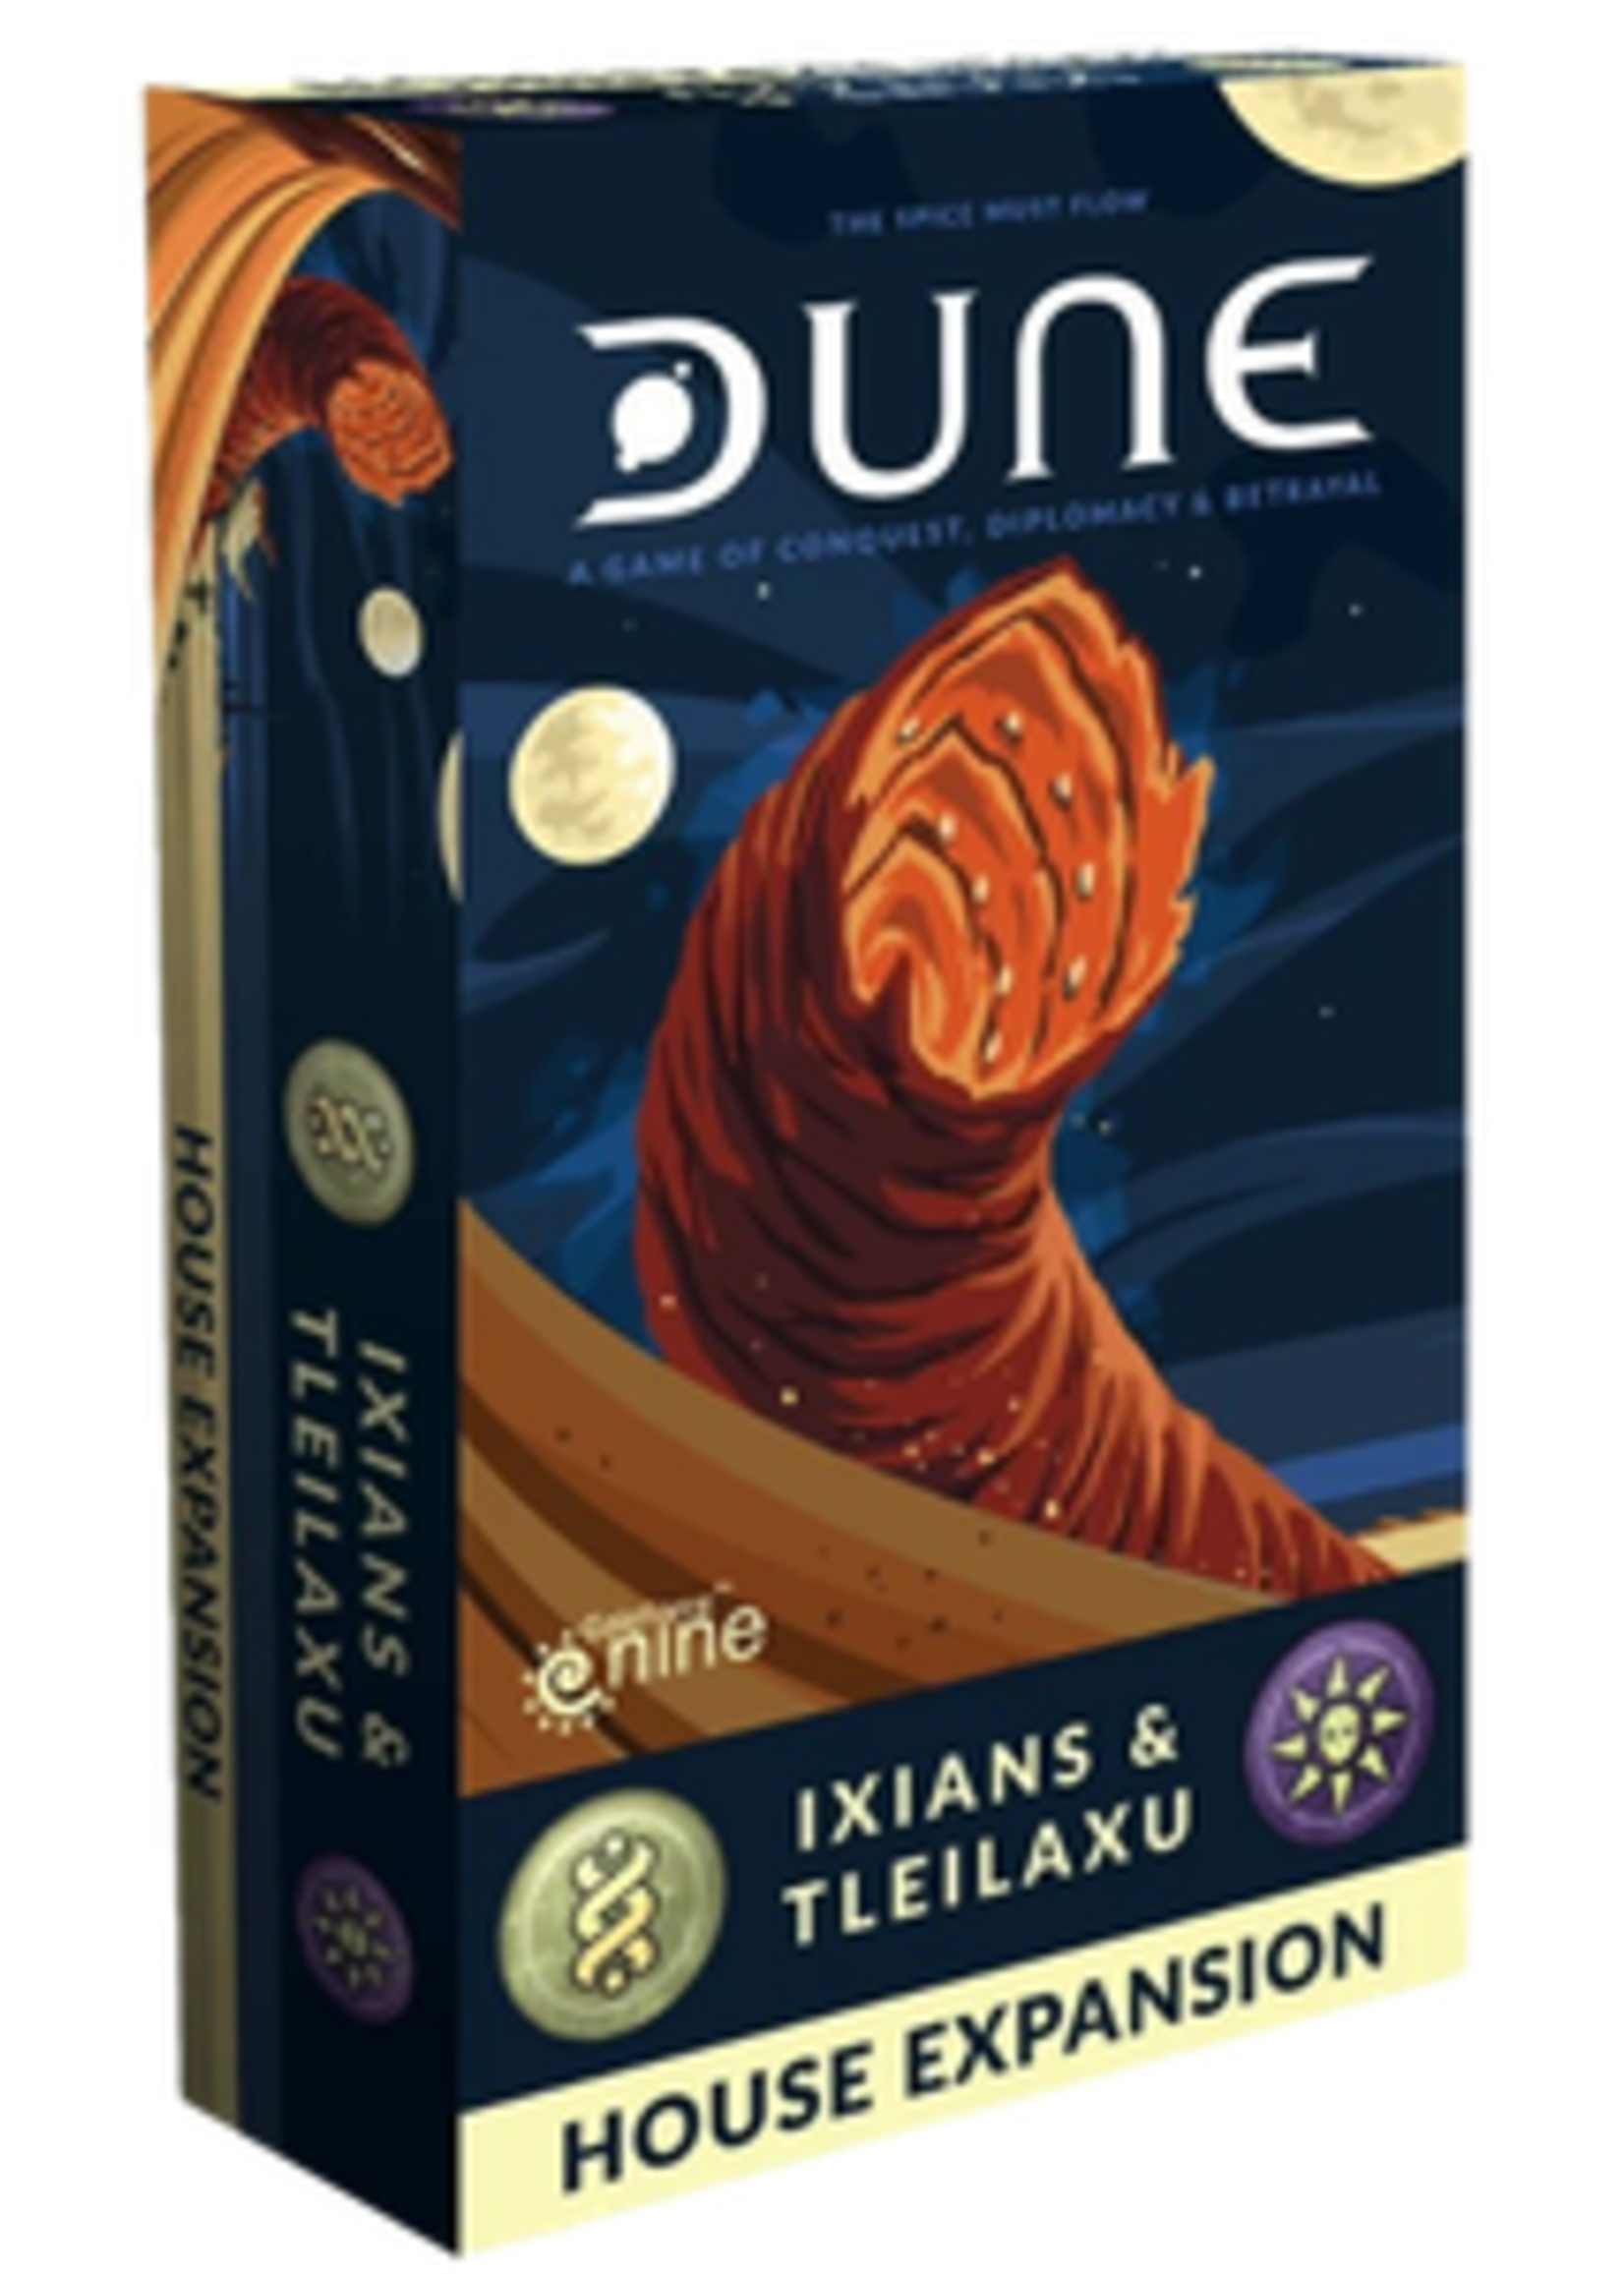 Dune - Ixians & Tleilaxu House Expansion